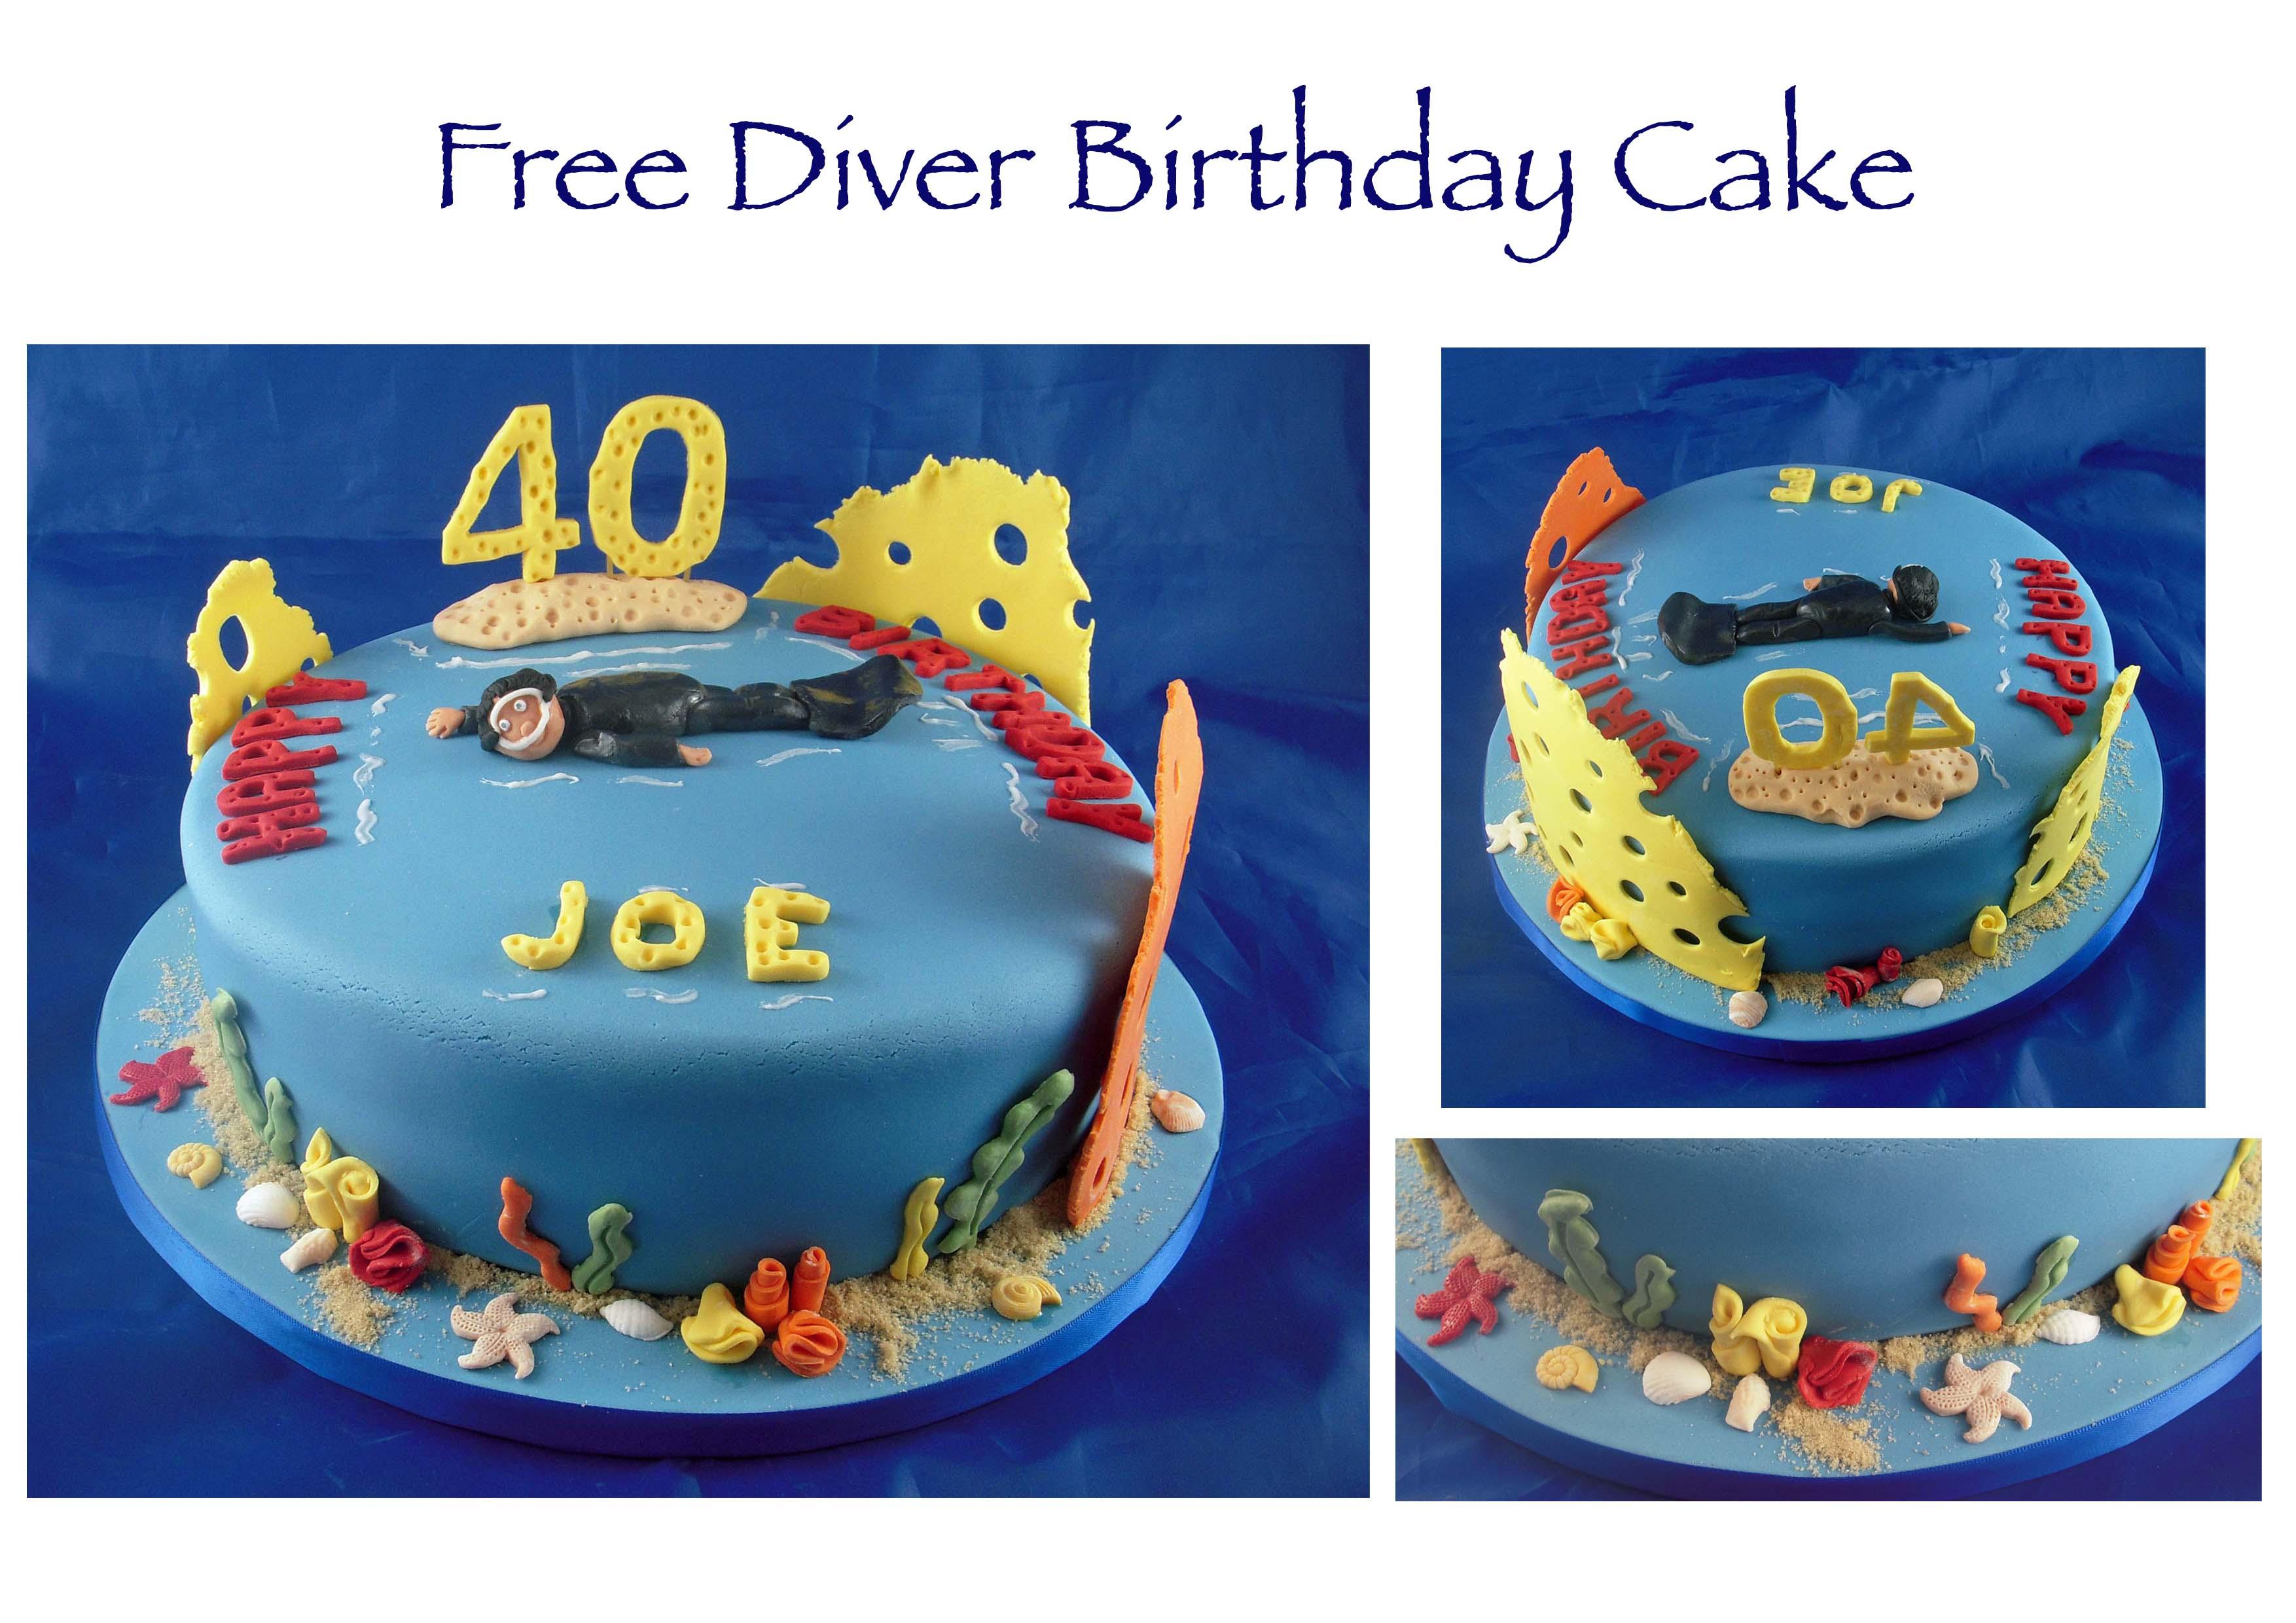 Free Diver Birthday Cake